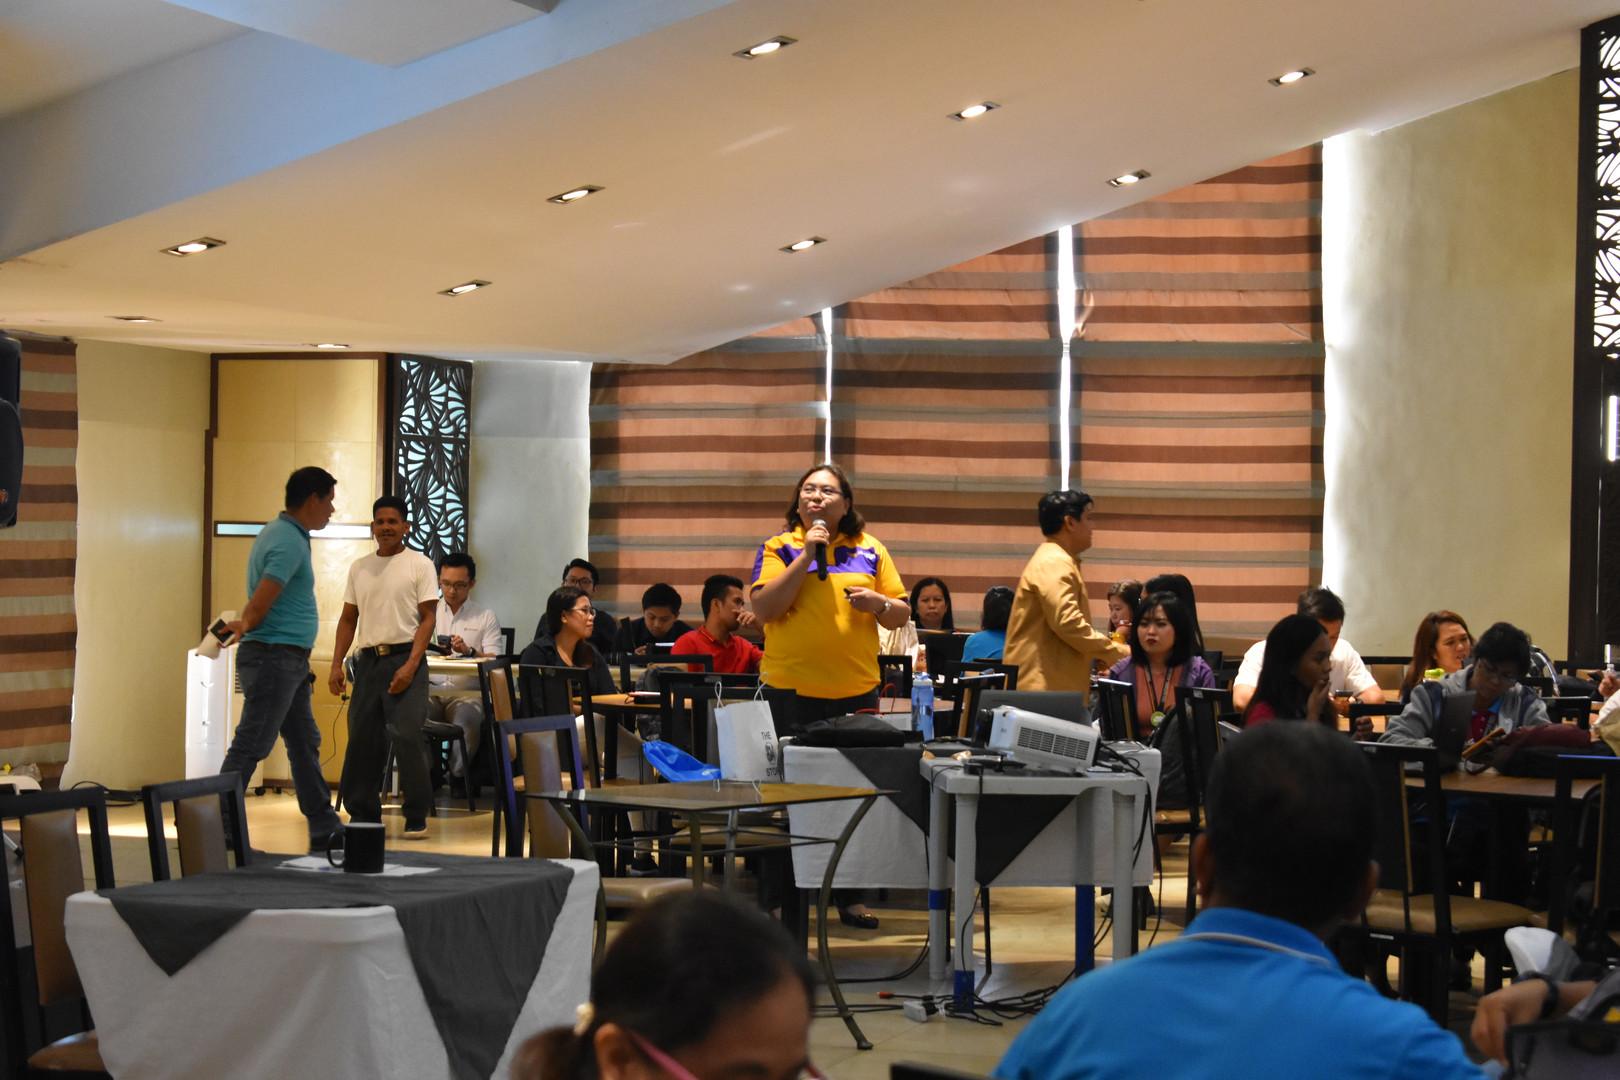 Ms. Marissa Tagado, Business Head of Region IV – A of City Savings Bank